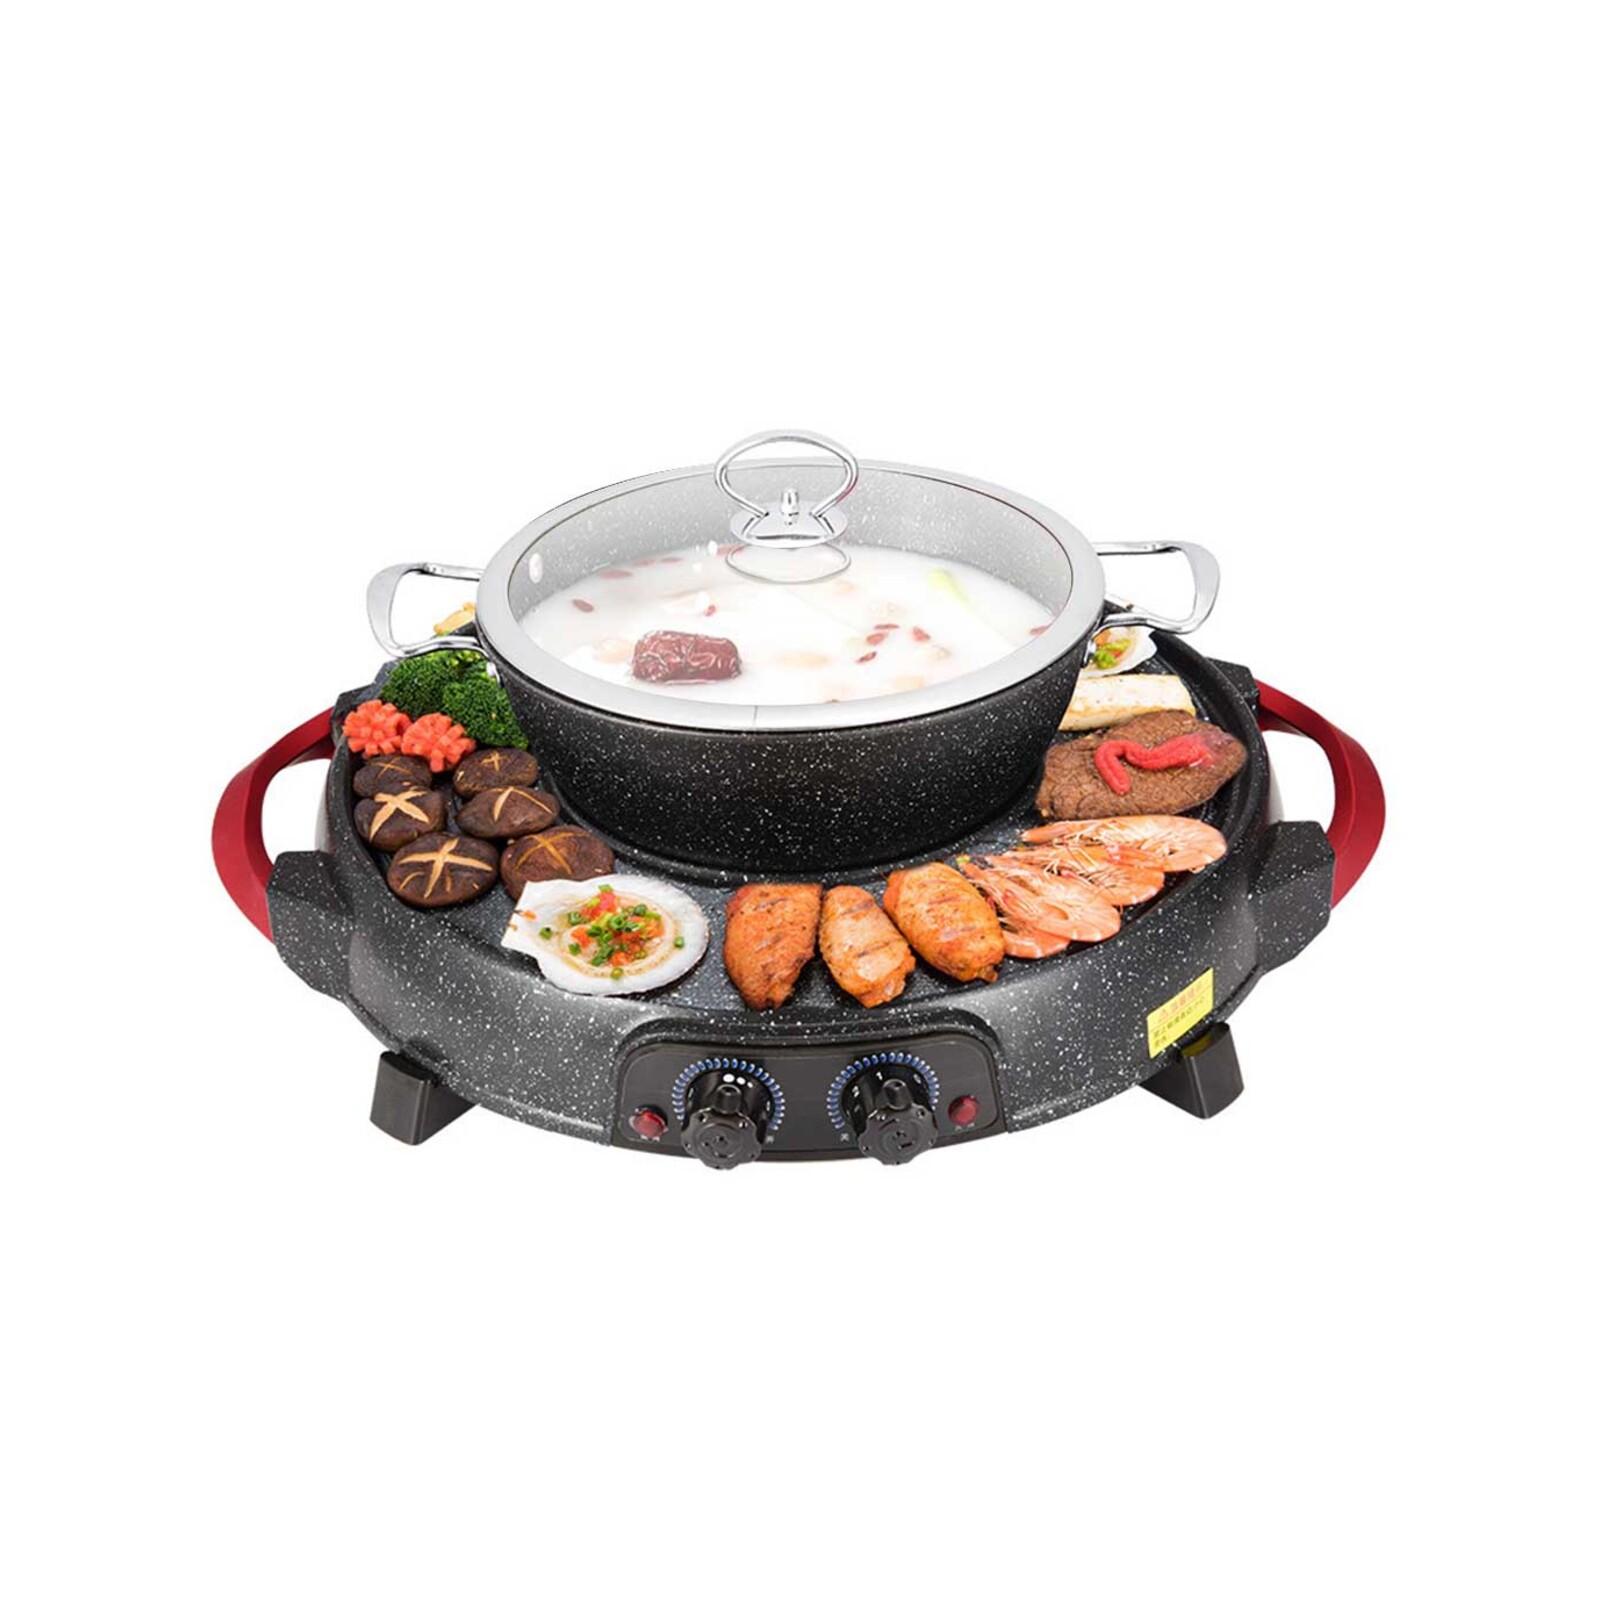 SOGA 2 in 1 Electric Stone Coated Teppanyaki Grill Plate Steamboat Hotpot